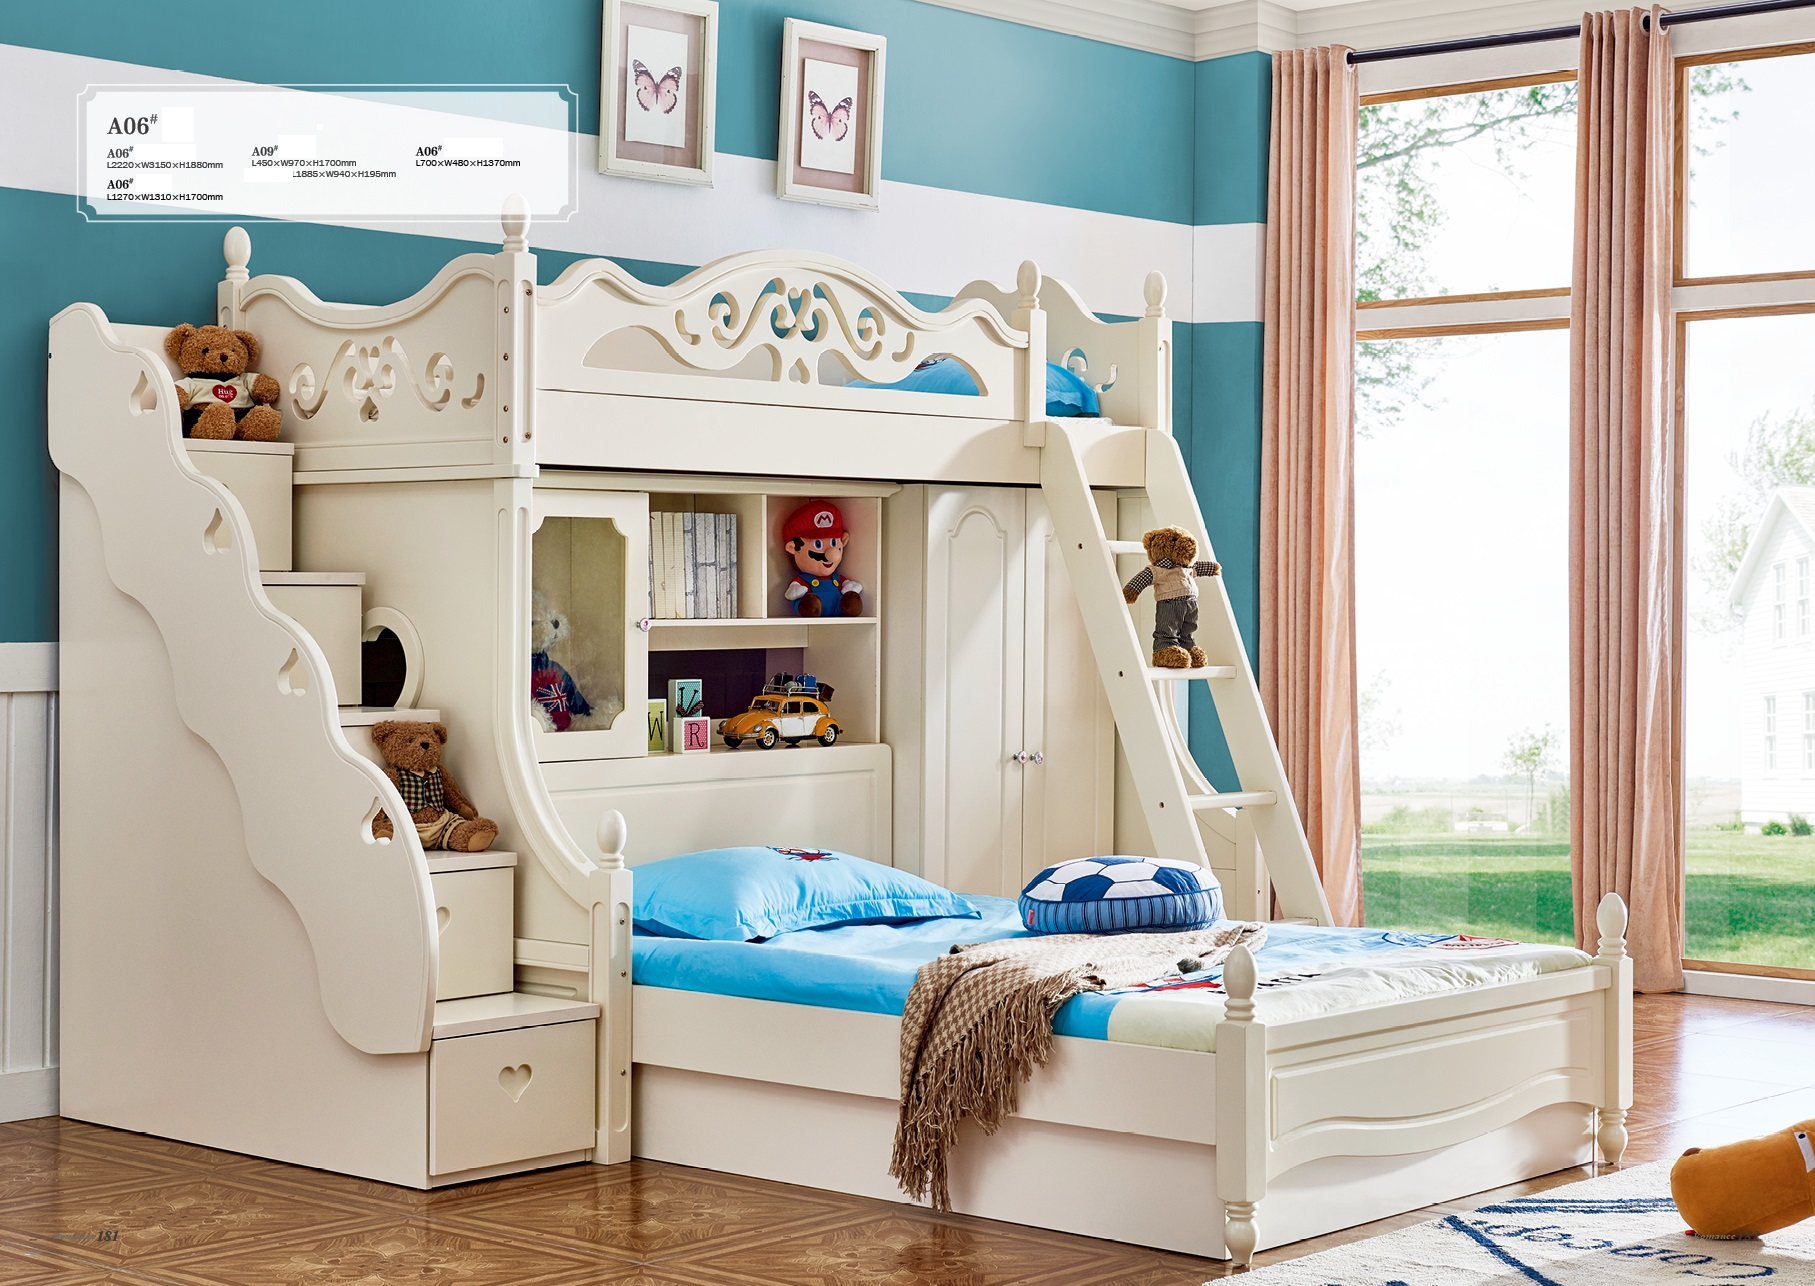 Etagenbett Für 3 Kinder : Hochbett fur kinder a fa r etagen